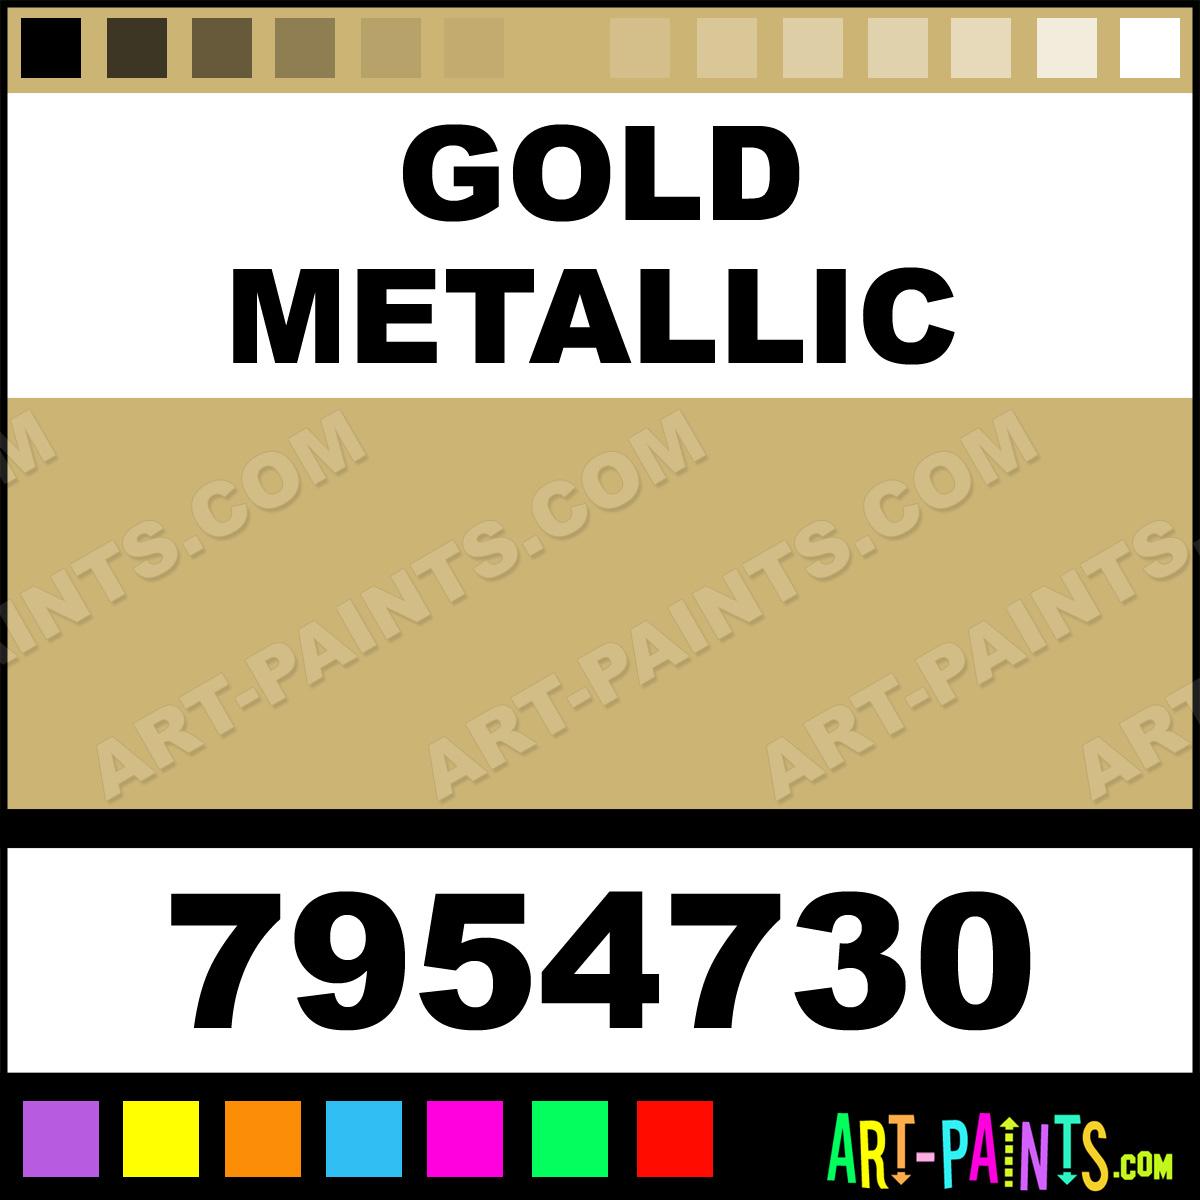 Gold Metallic Satin Finishes Ceramic Paints 7954730 Gold Metallic Paint Gold Metallic Color